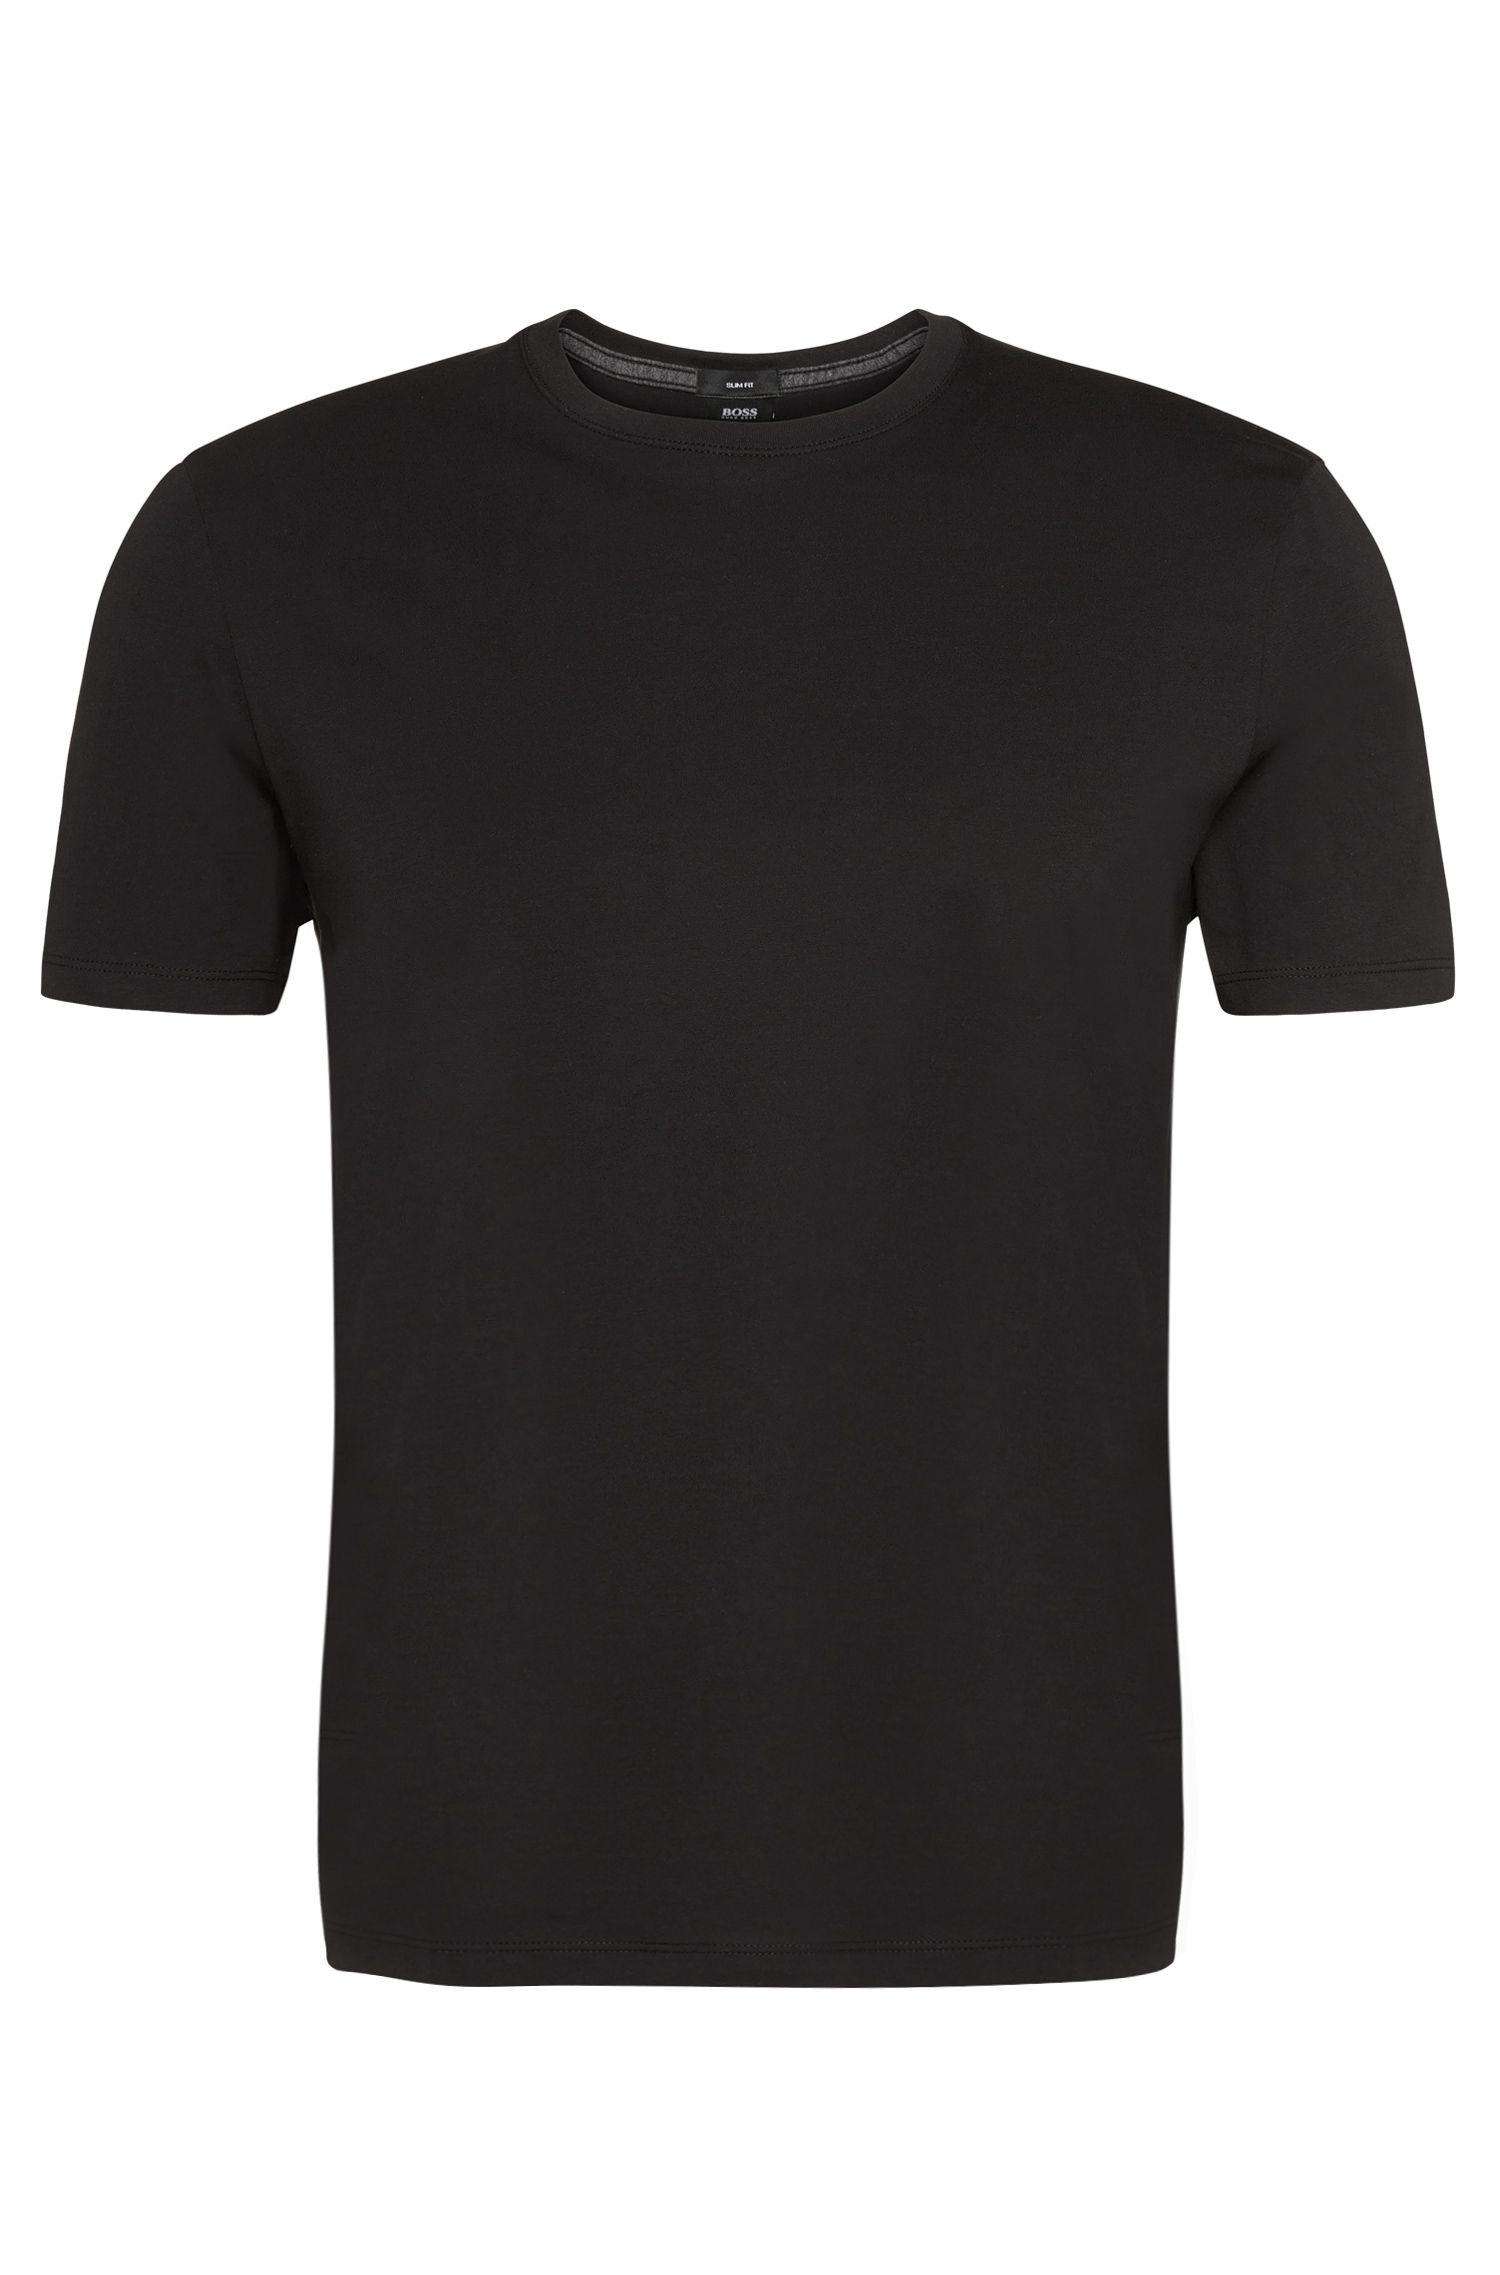 T-shirt Slim Fit en coton: «Tessler09»